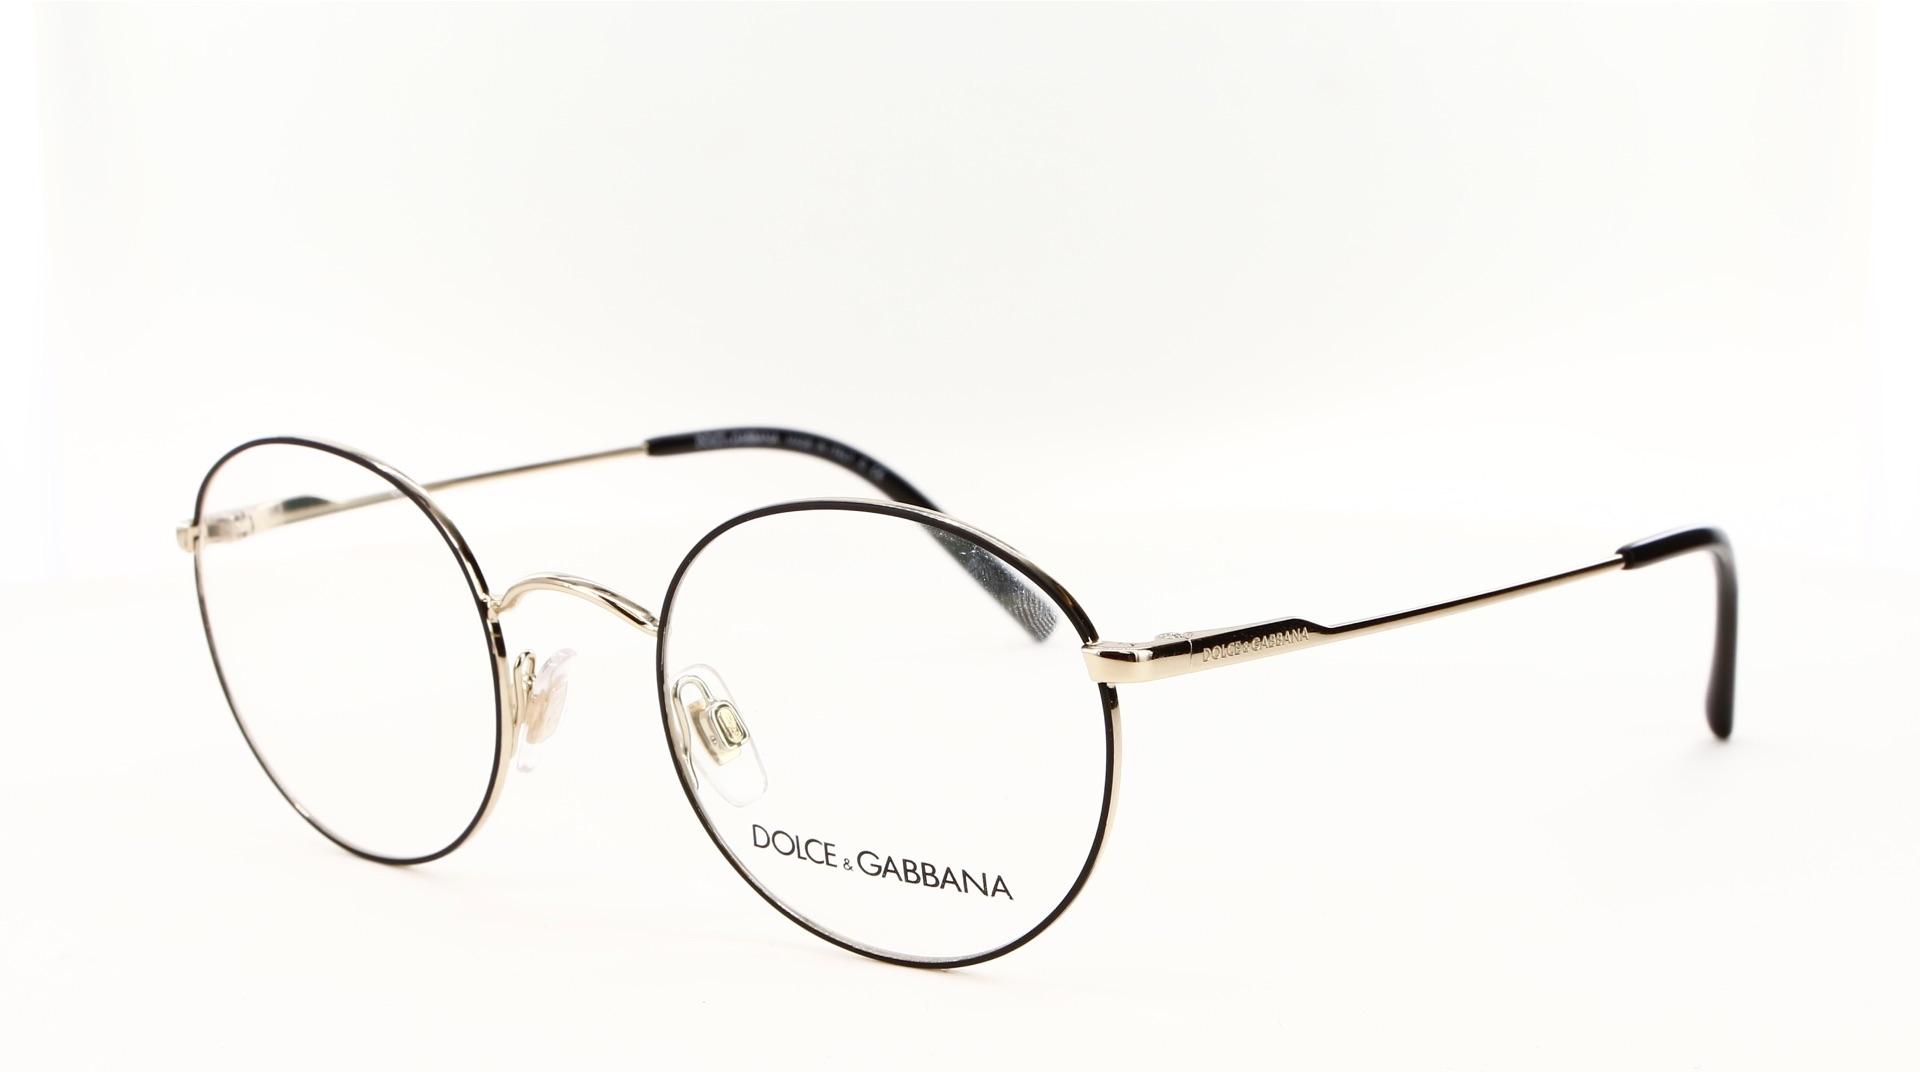 Dolce & Gabbana - ref: 76712